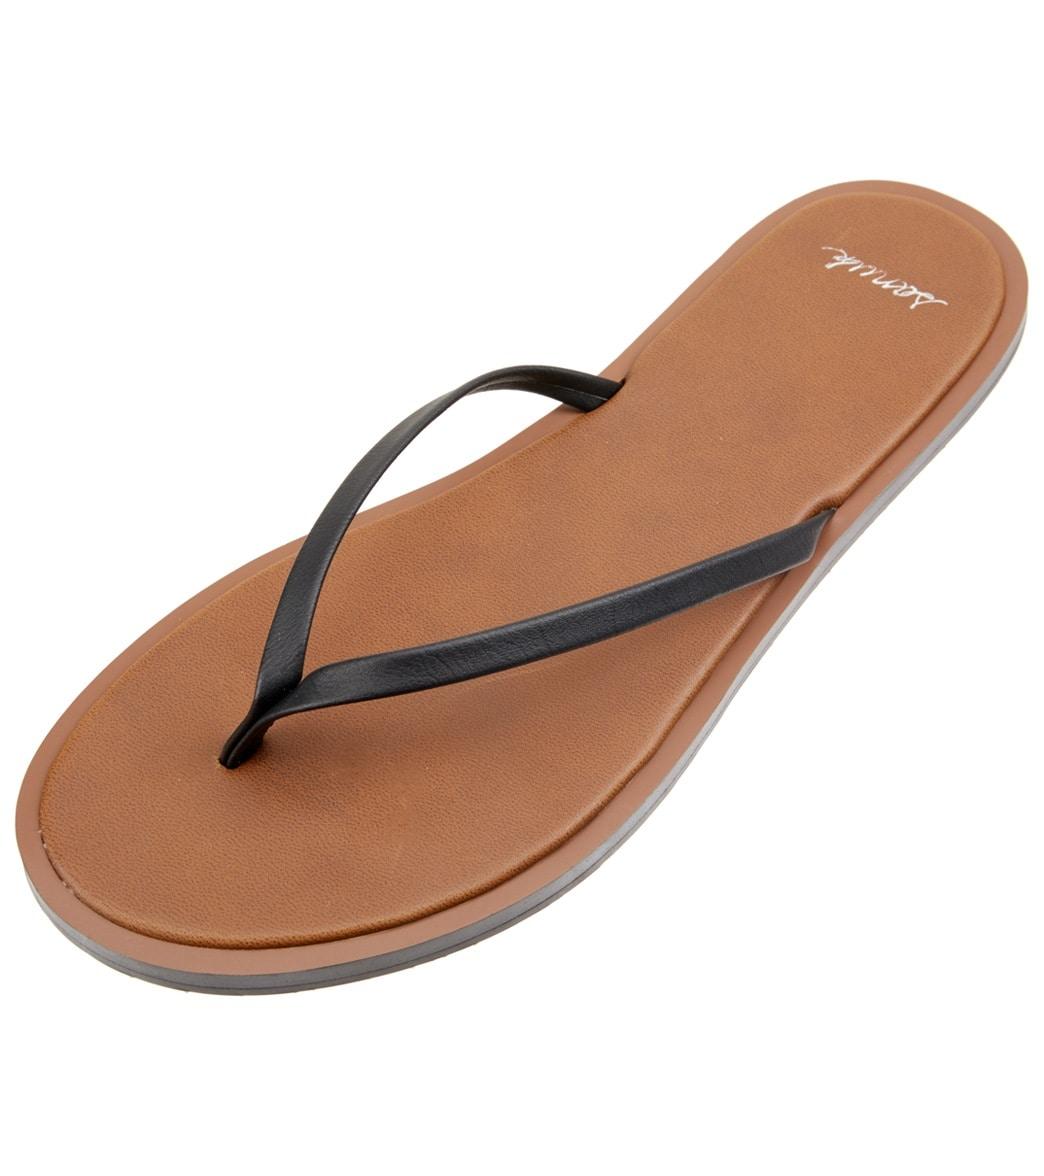 Sanuk Sandals Womens Yoga Aurora Sandal Footwear Vivid Violet